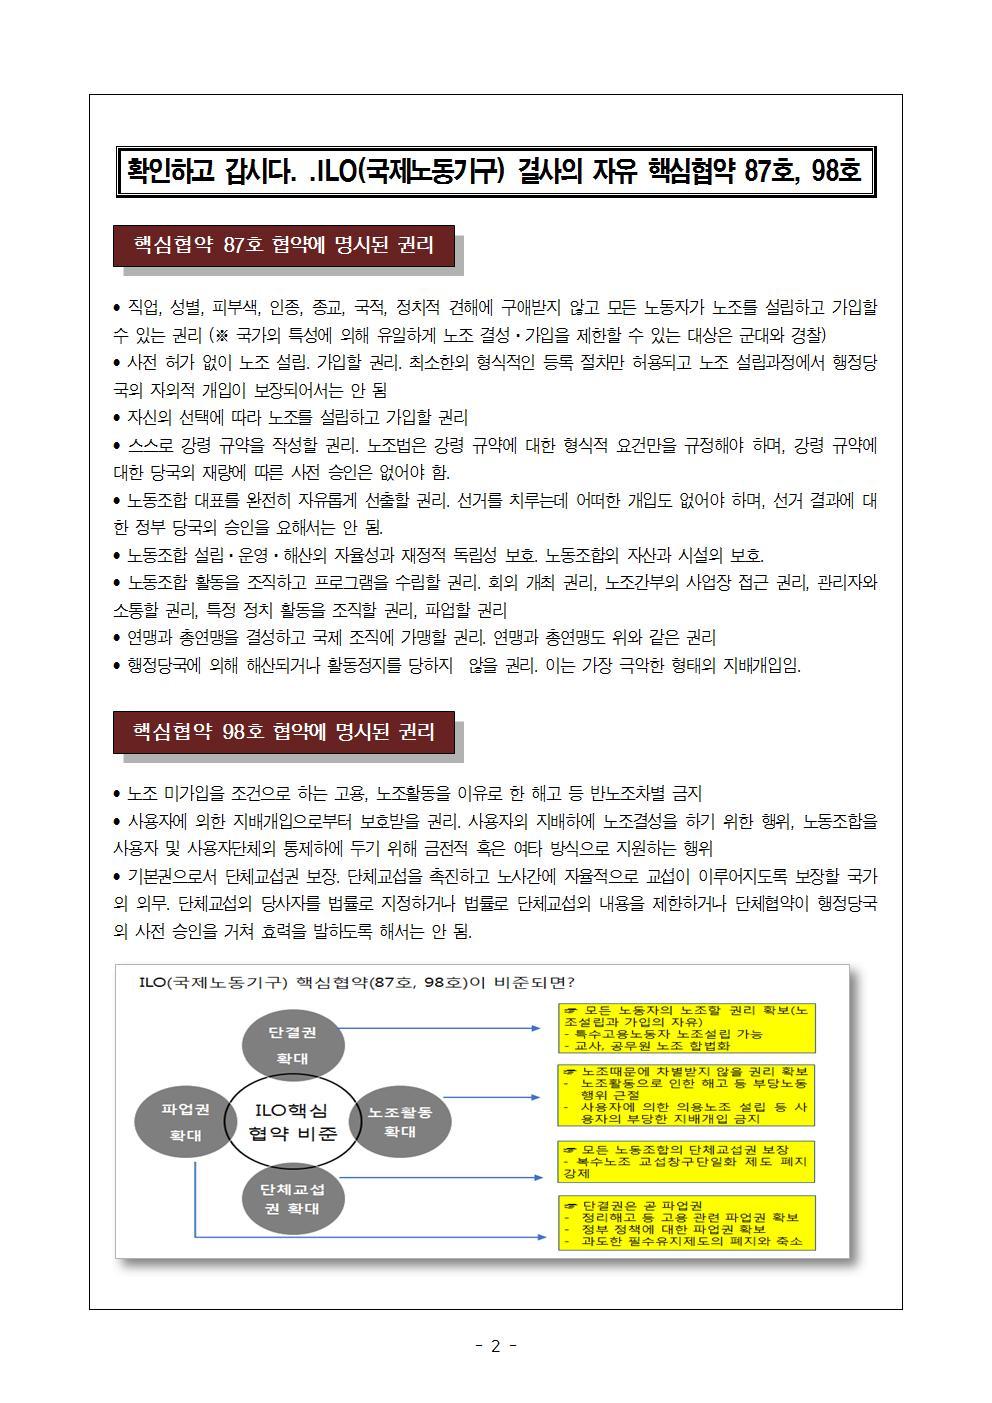 ilo현장교육지002.jpg